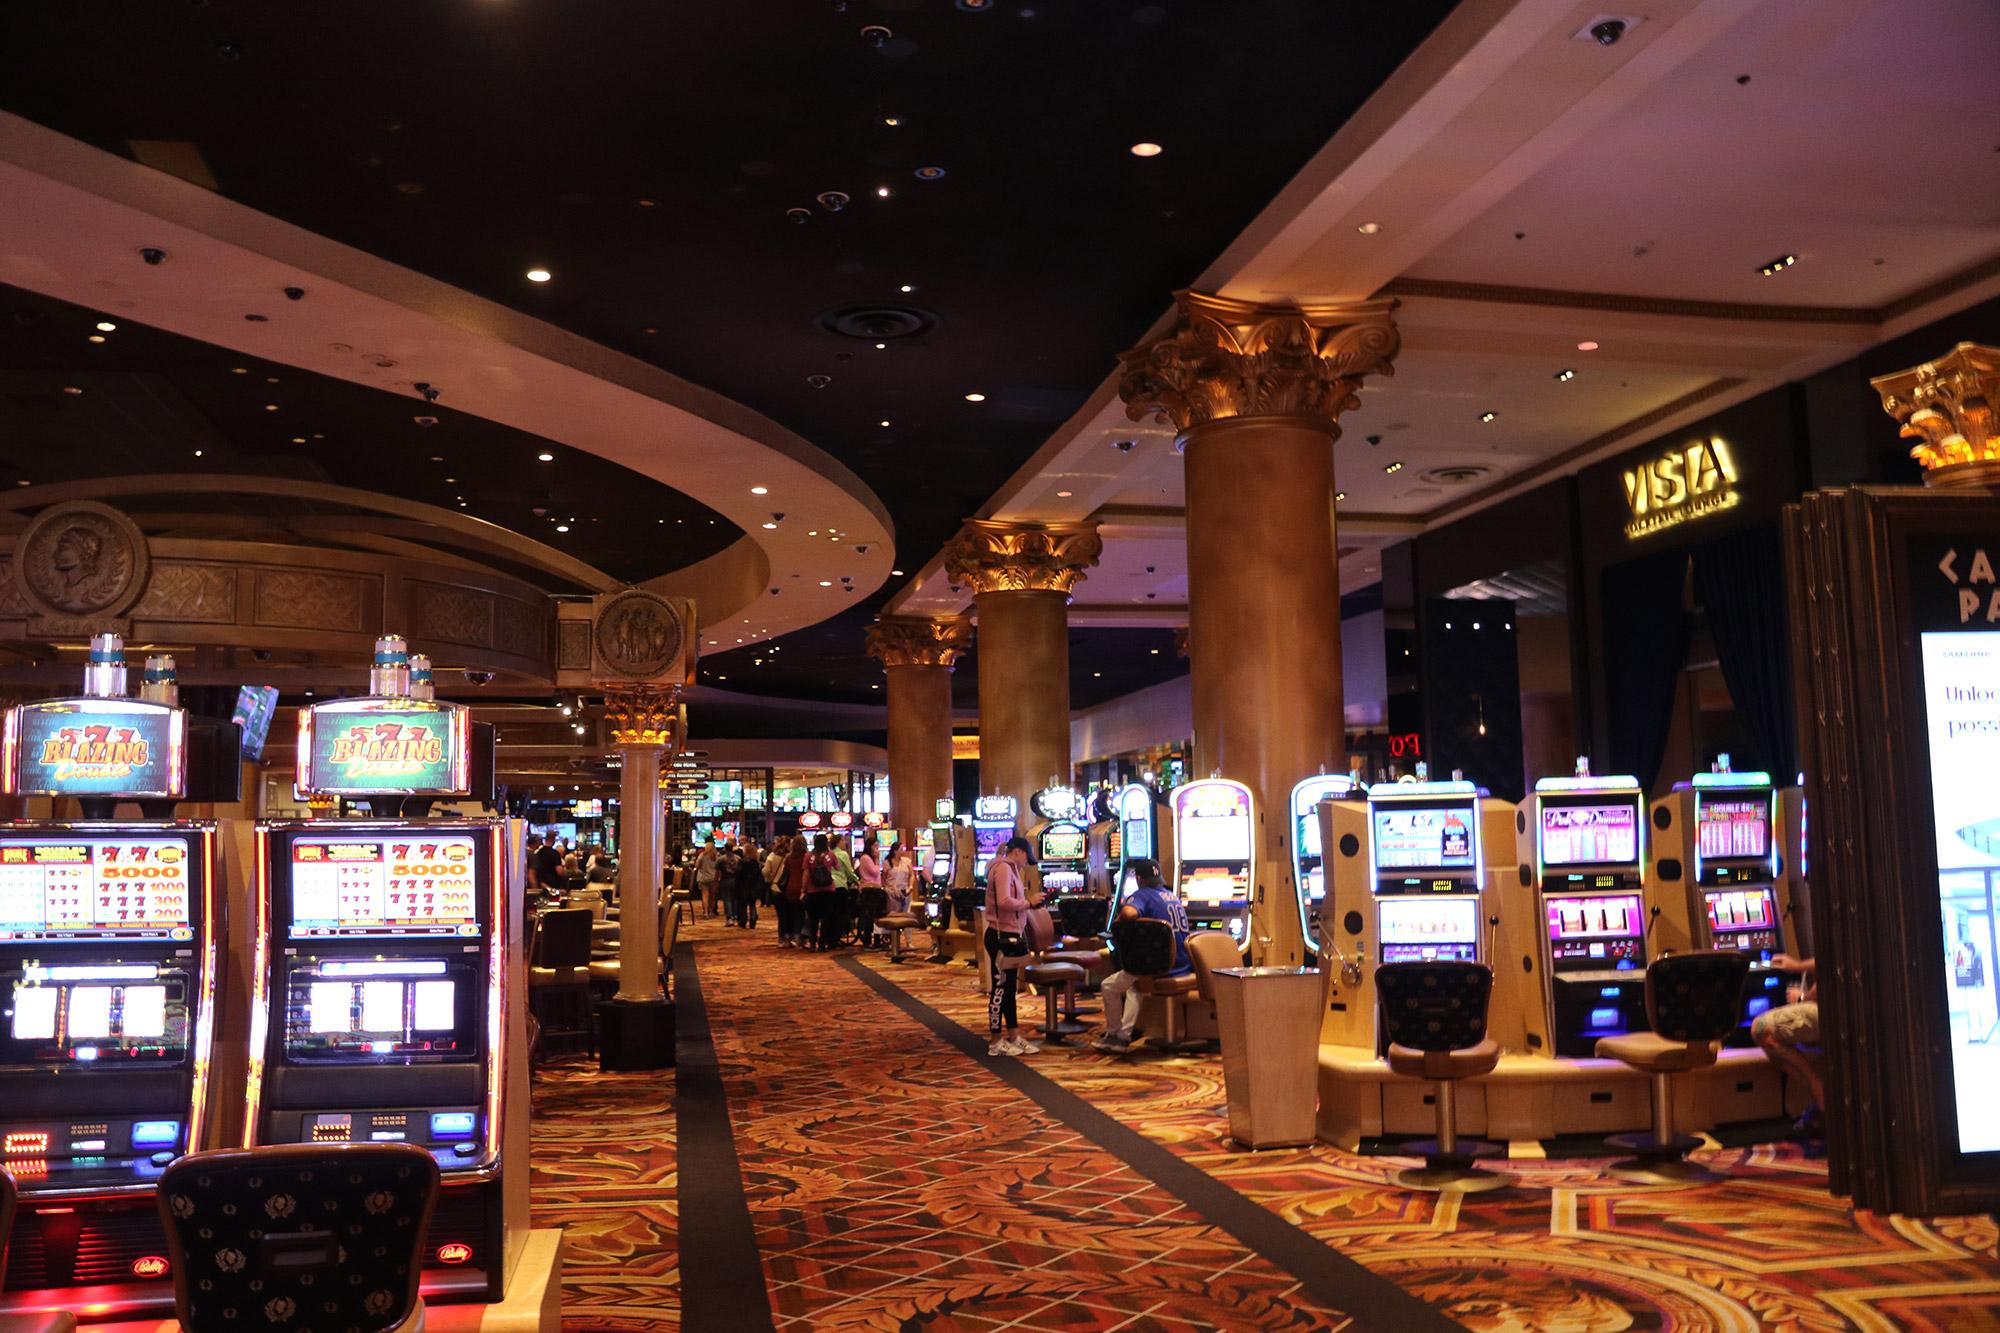 Amerika dag 17 - Las Vegas - Gokken in Caesars Palace